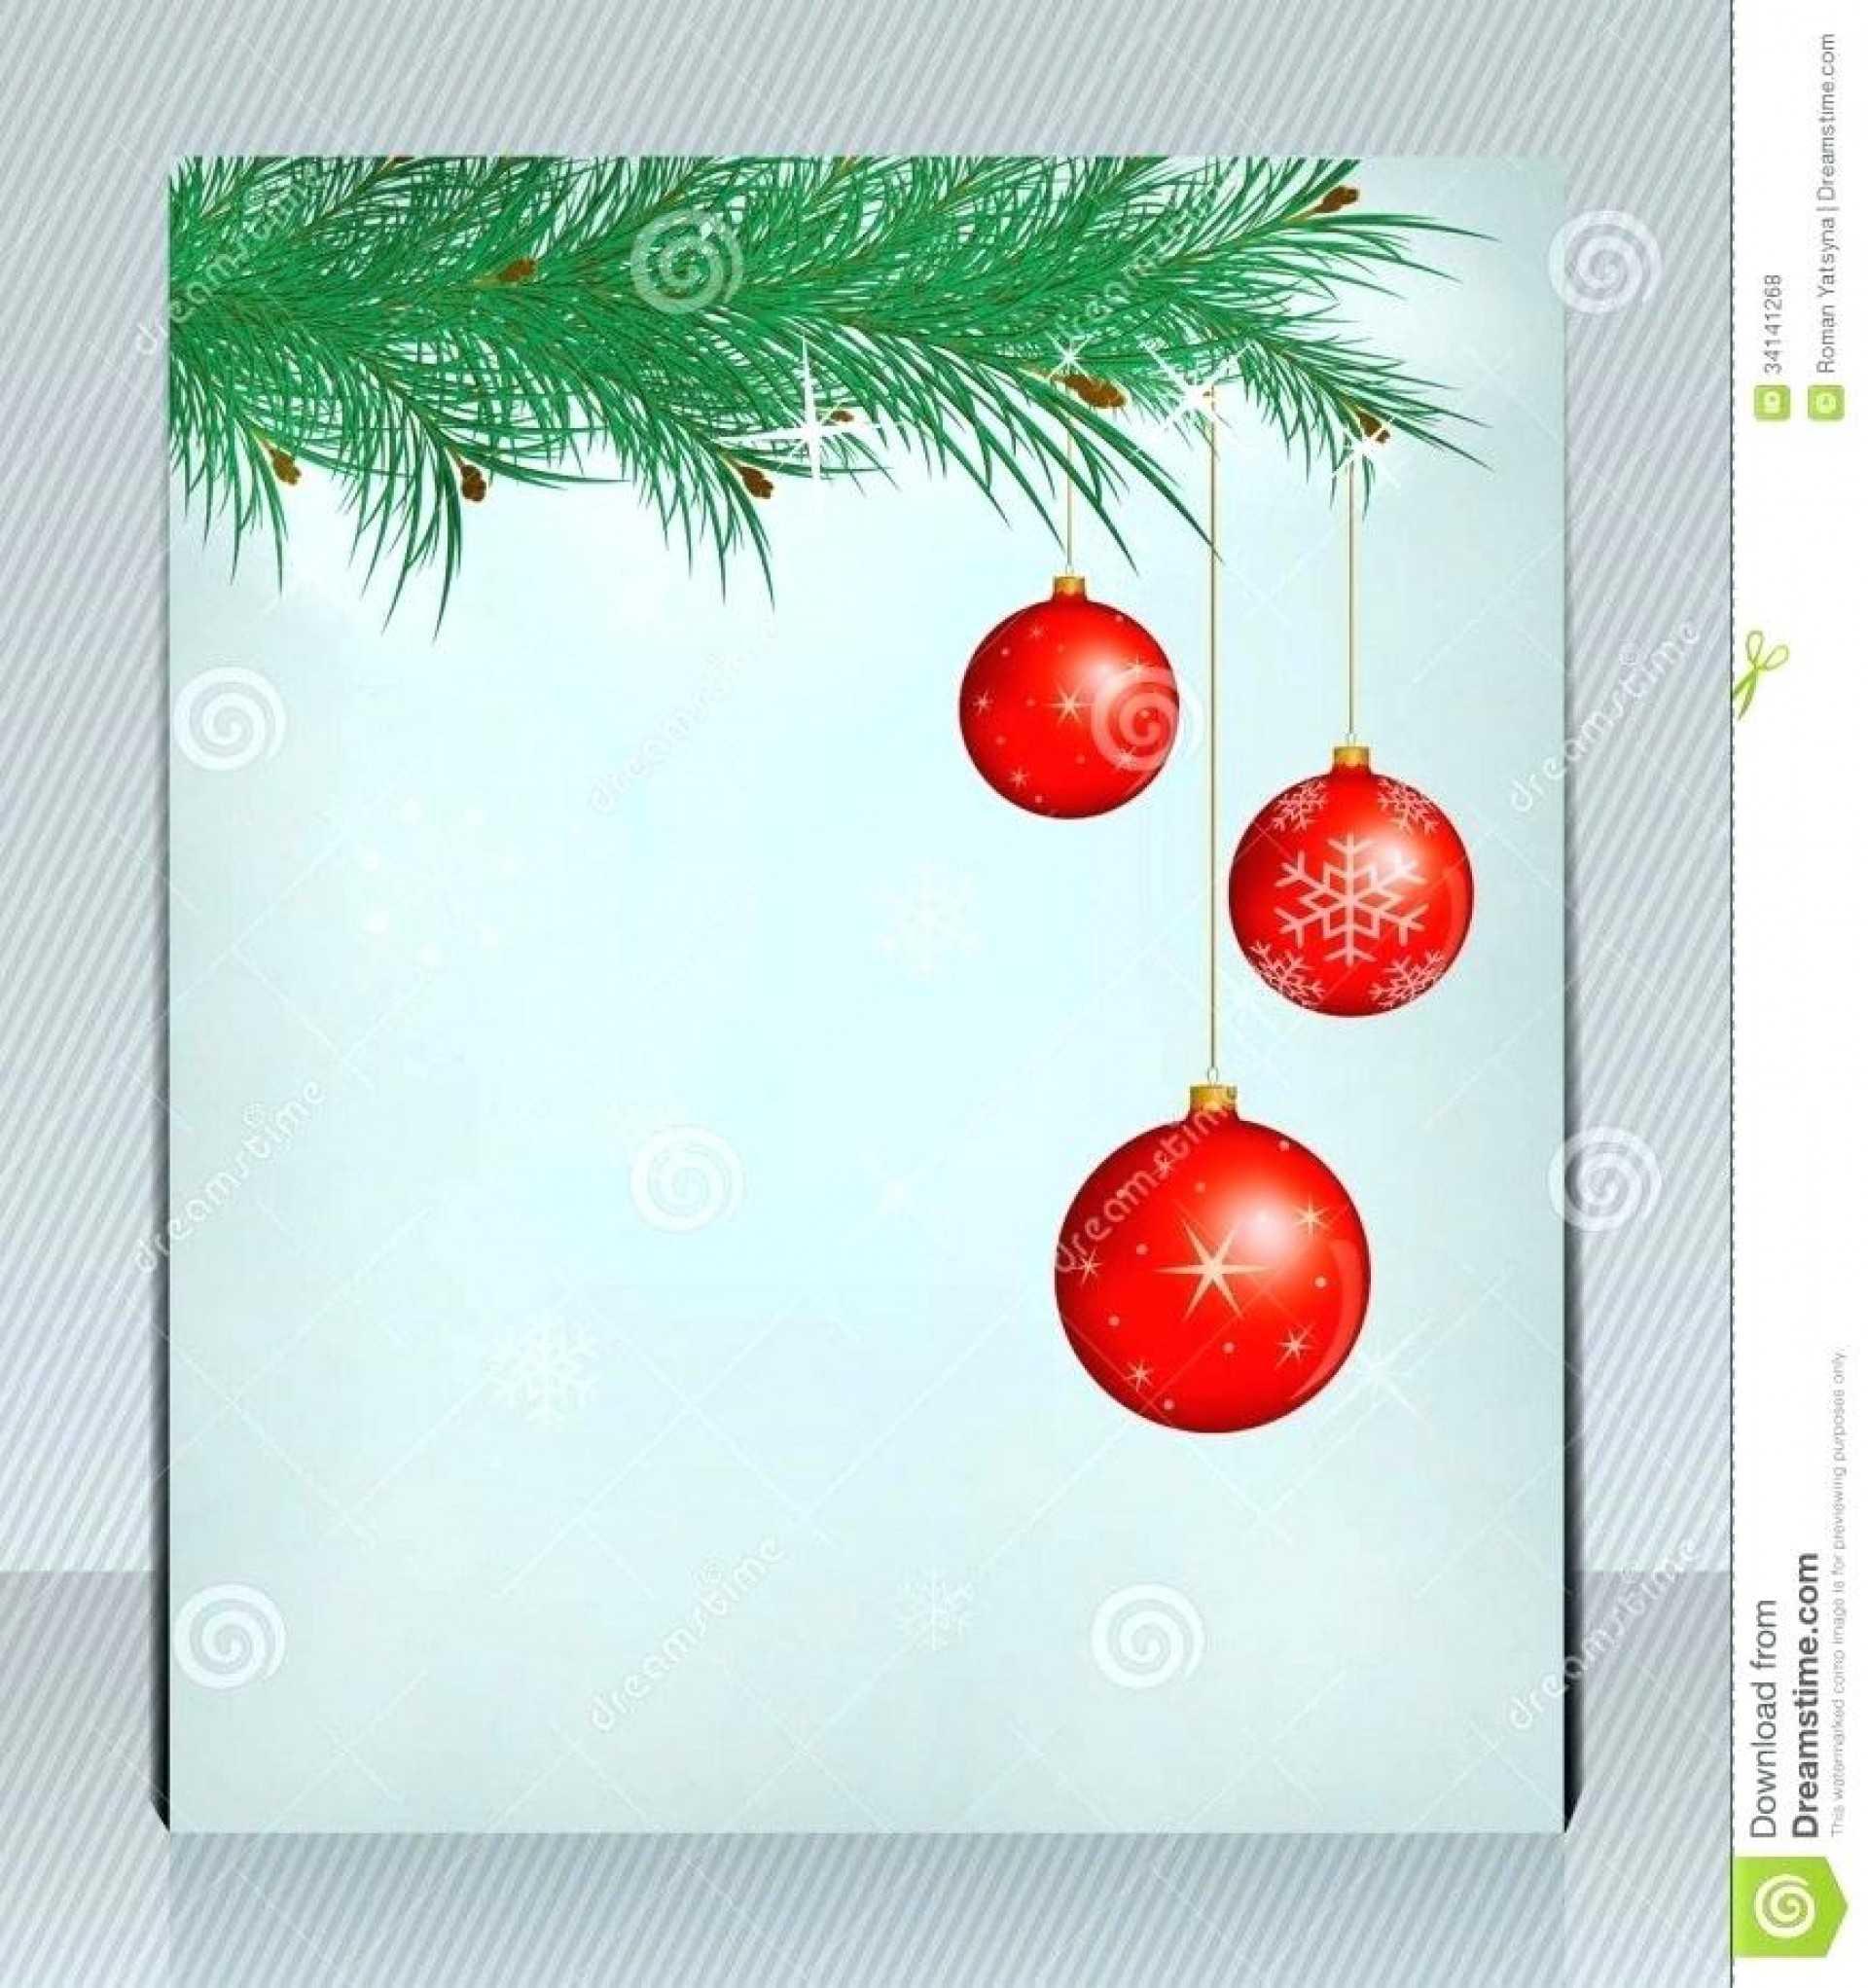 012 Template Ideas Free Holiday Sensational Flyer Templates Inside Free Christmas Flyer Templates Word